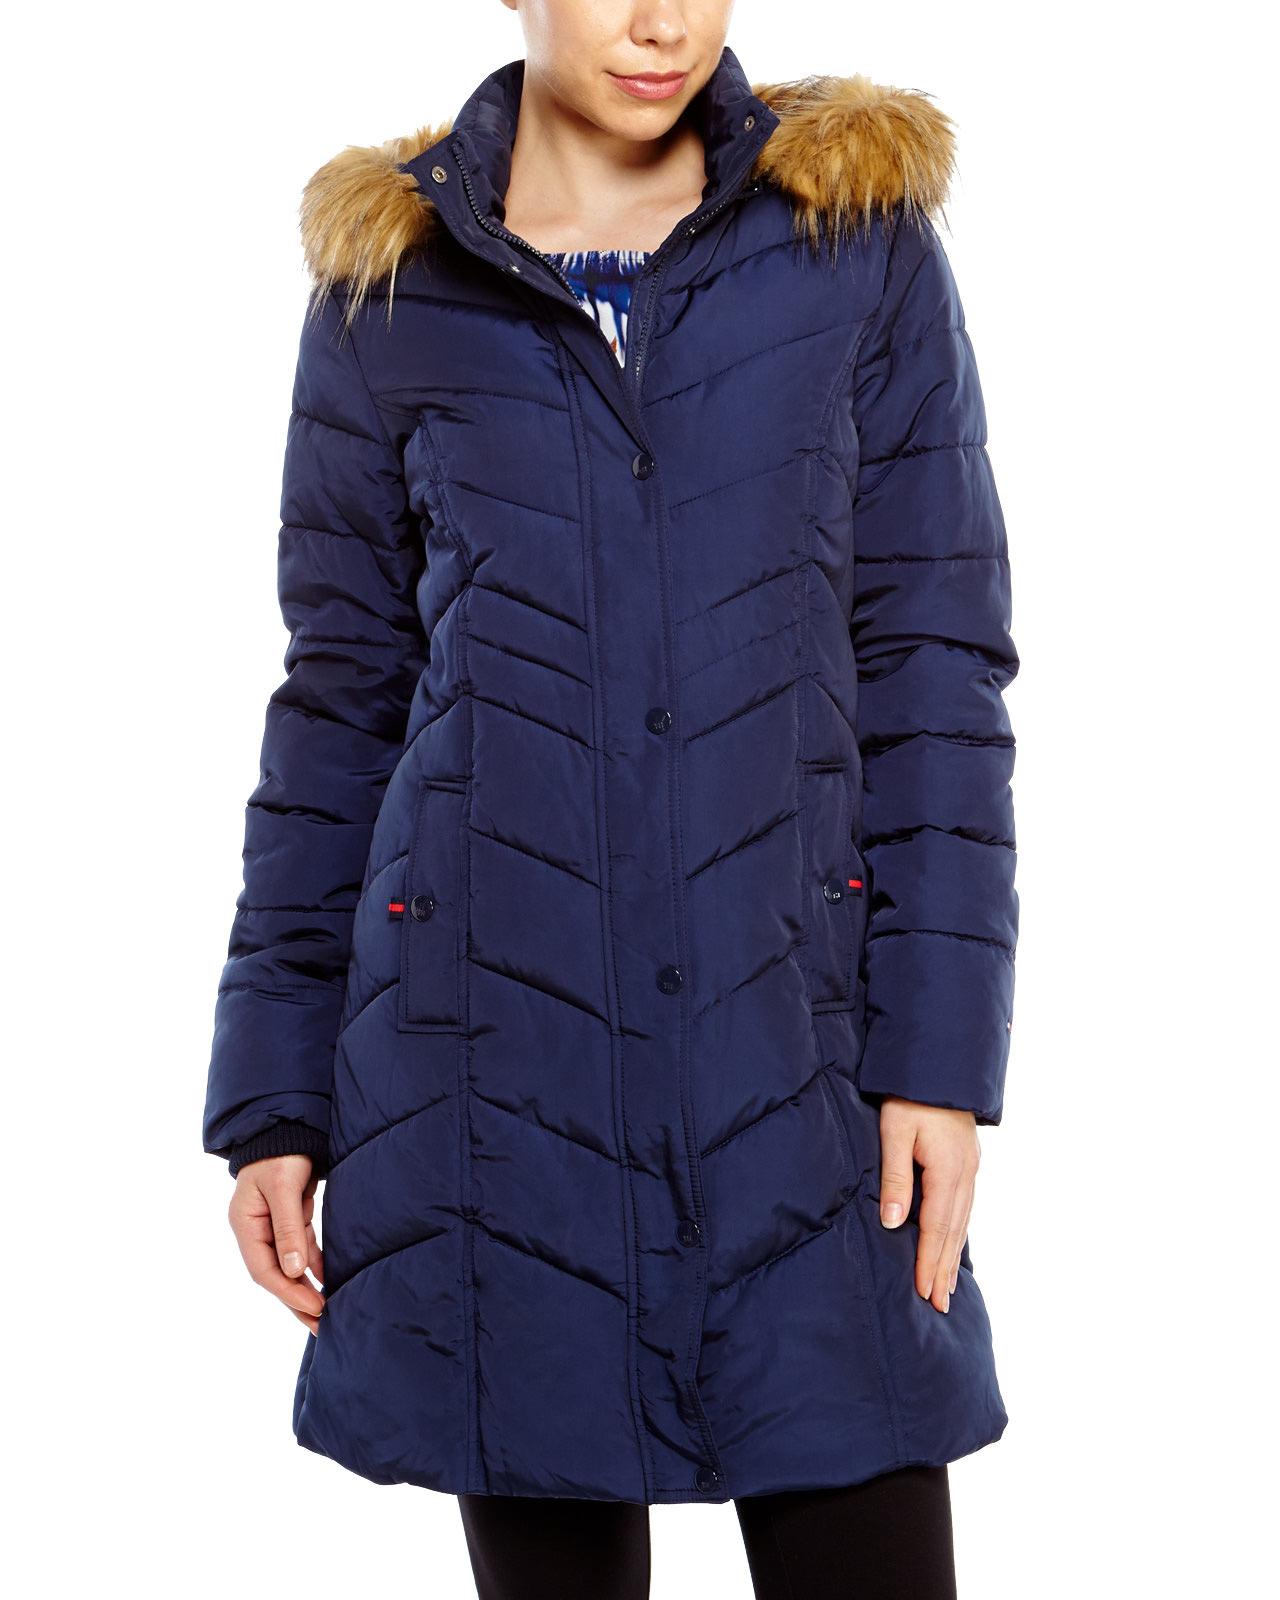 475c970be18d2 Lyst - Tommy Hilfiger Faux Fur Trim Hooded Long Coat in Blue